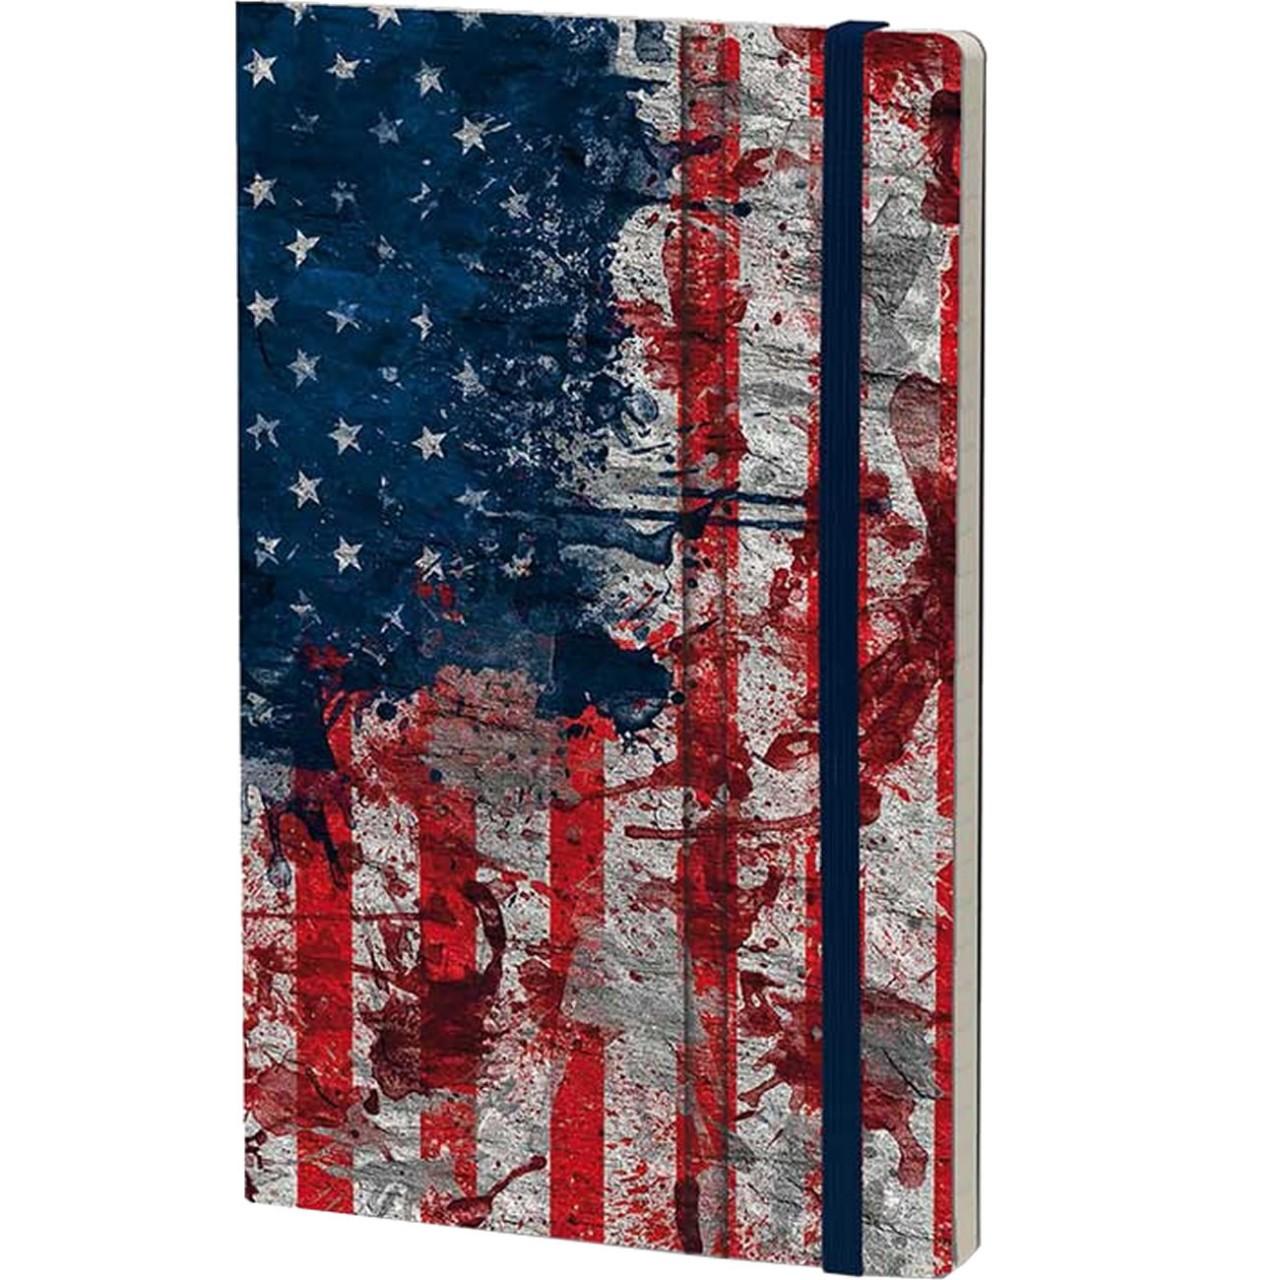 Stifflexible Notizbuch HISTORICAL NOTES 13 x 21 cm 192 S., I HAVE A DREAM (USA Flag)